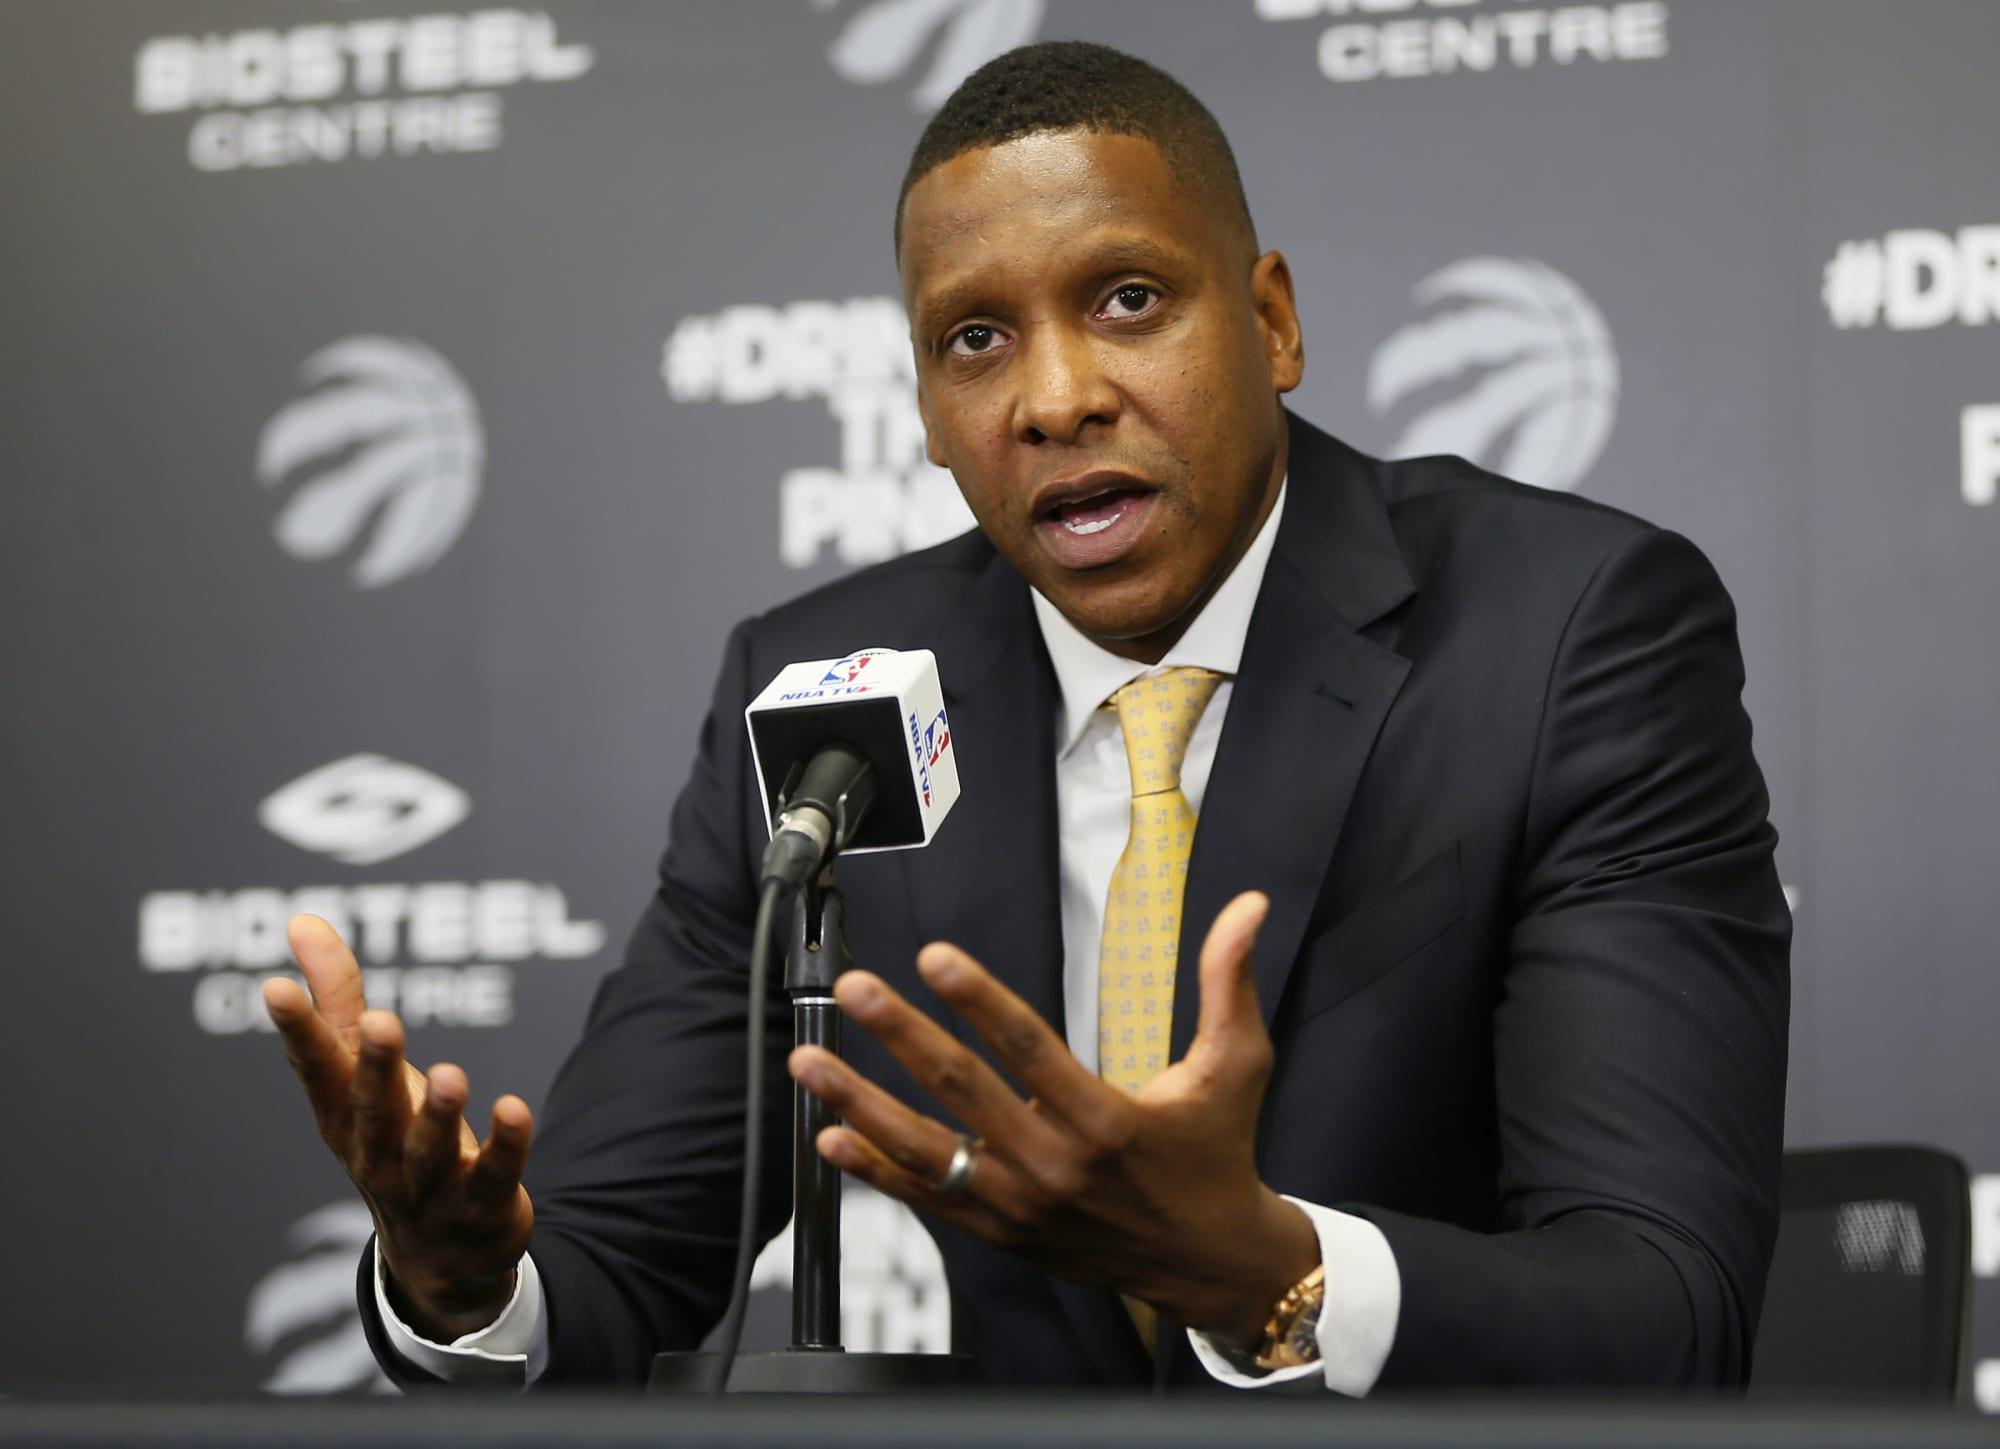 Toronto Raptors' 3-step plan for potential life without Masai Ujiri